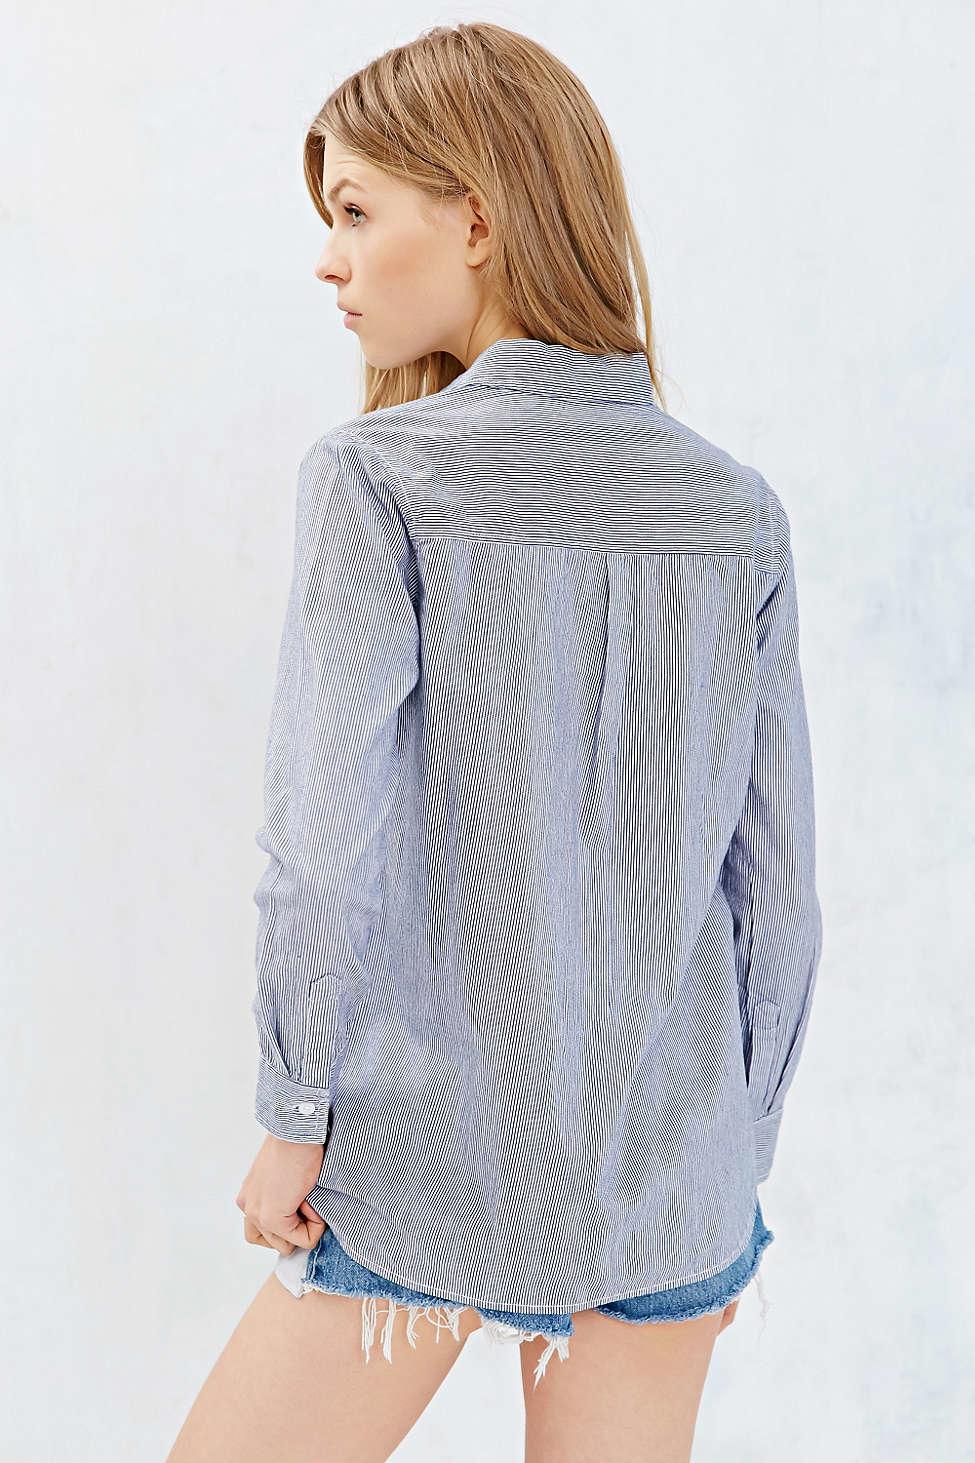 c2e174b942d Lyst - BDG Classic White Oxford Button-down Shirt in Blue